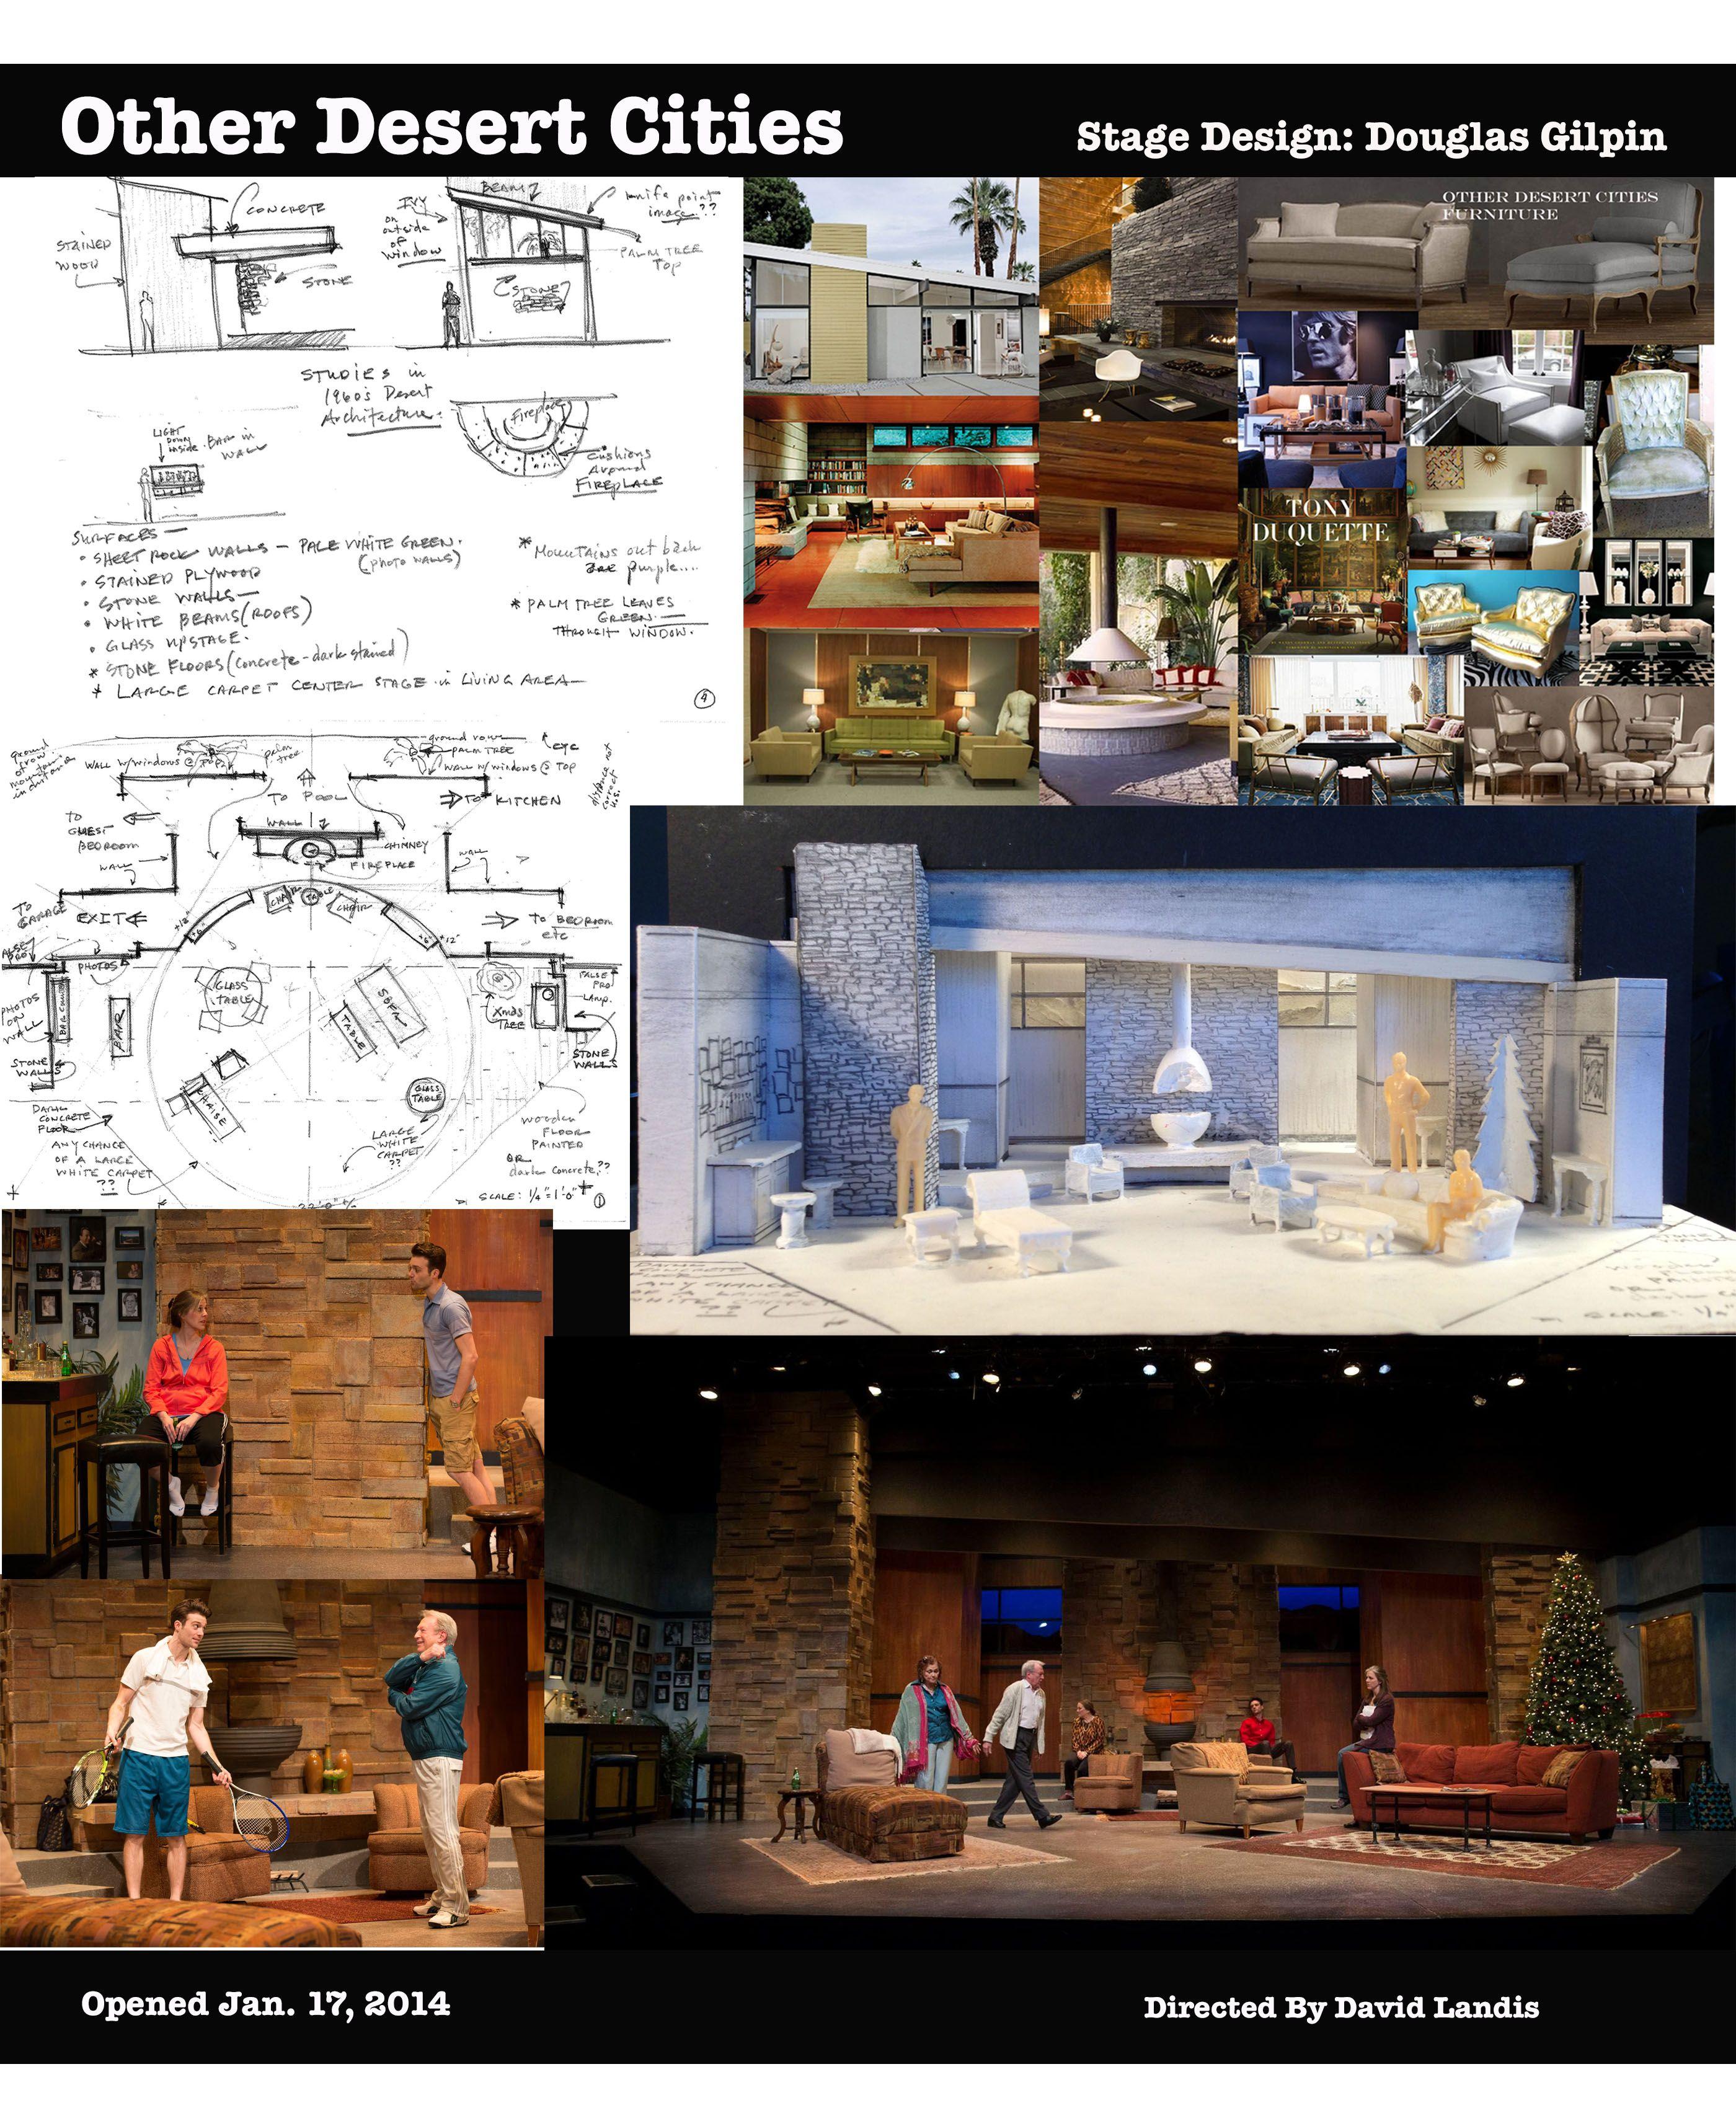 Admirable Other Desert Cities Memphis Circuit Playhouse Portfolio Home Interior And Landscaping Ologienasavecom